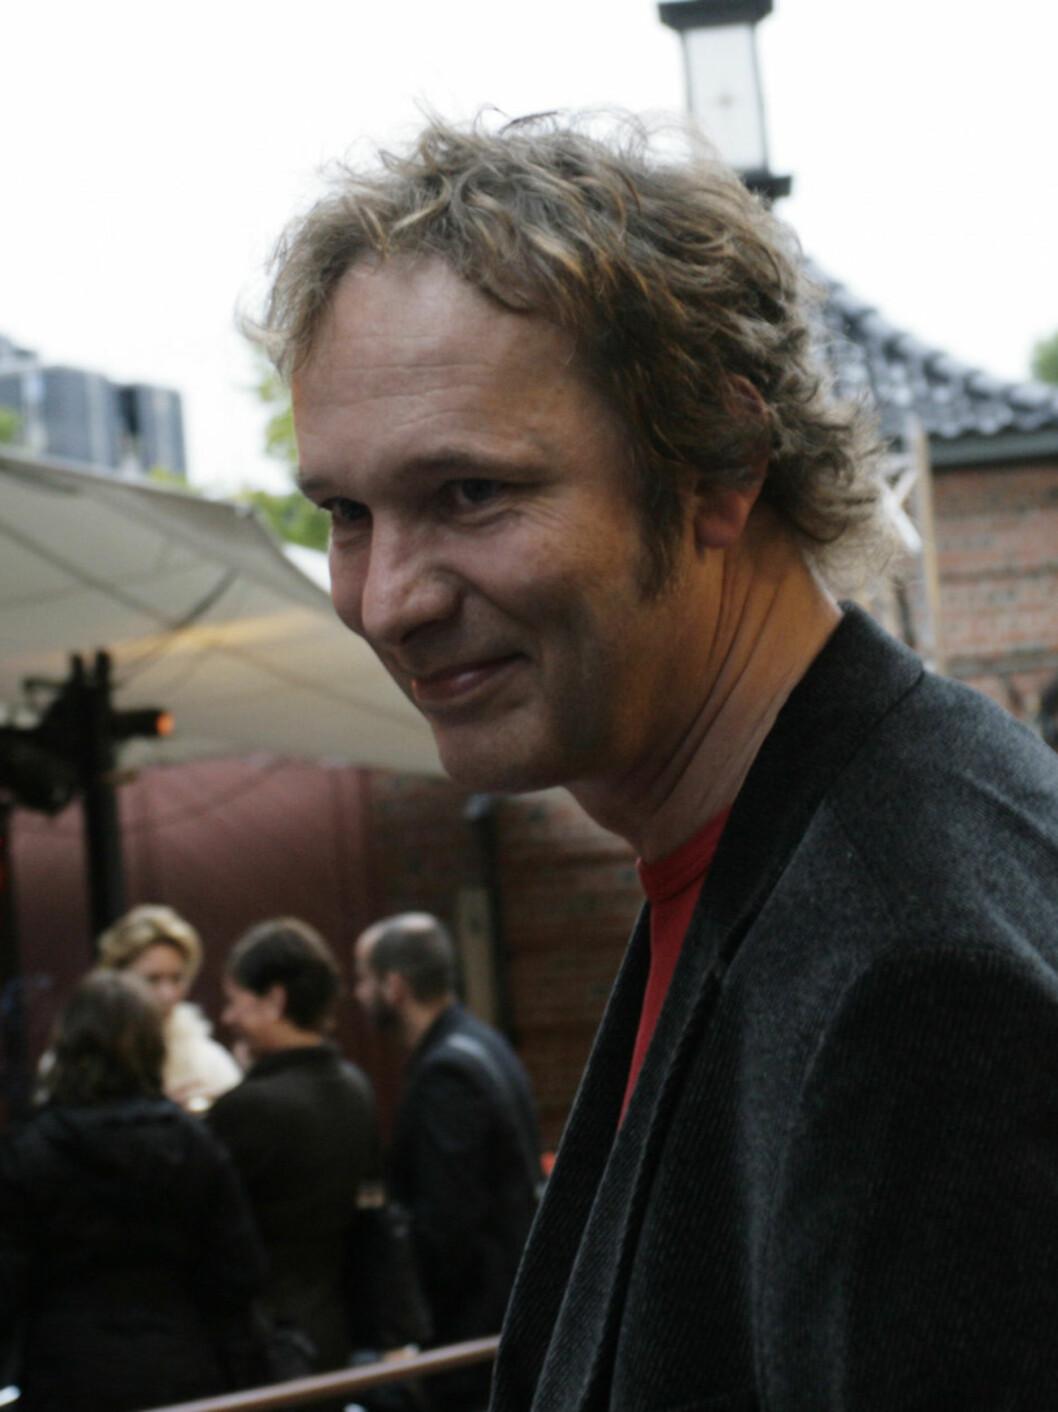 PÅ LATTER: NRK-programleder Claus Wiese (48) på Latter. Foto: Seher.no